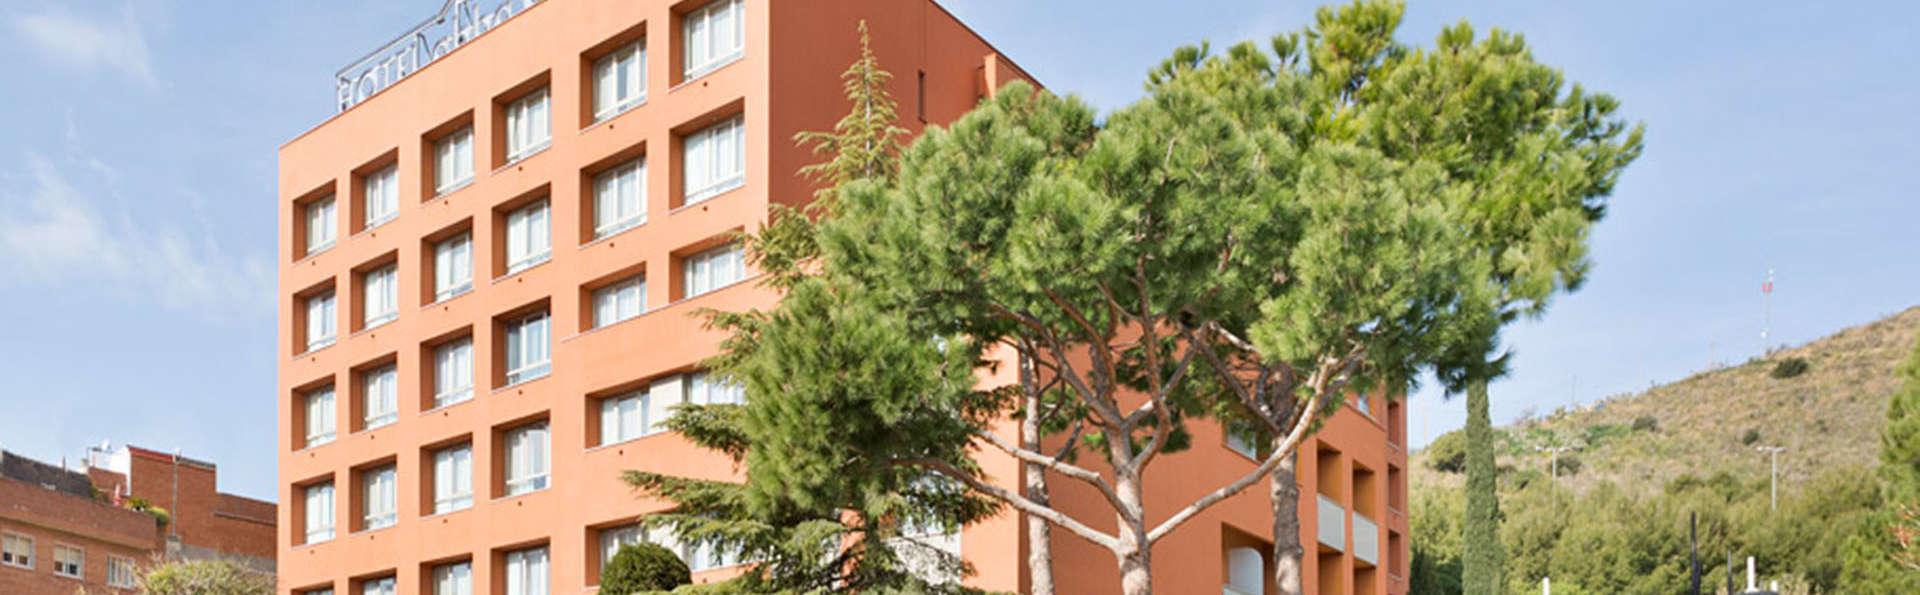 Hotel Abba Garden - EDIT_FRONT.jpg